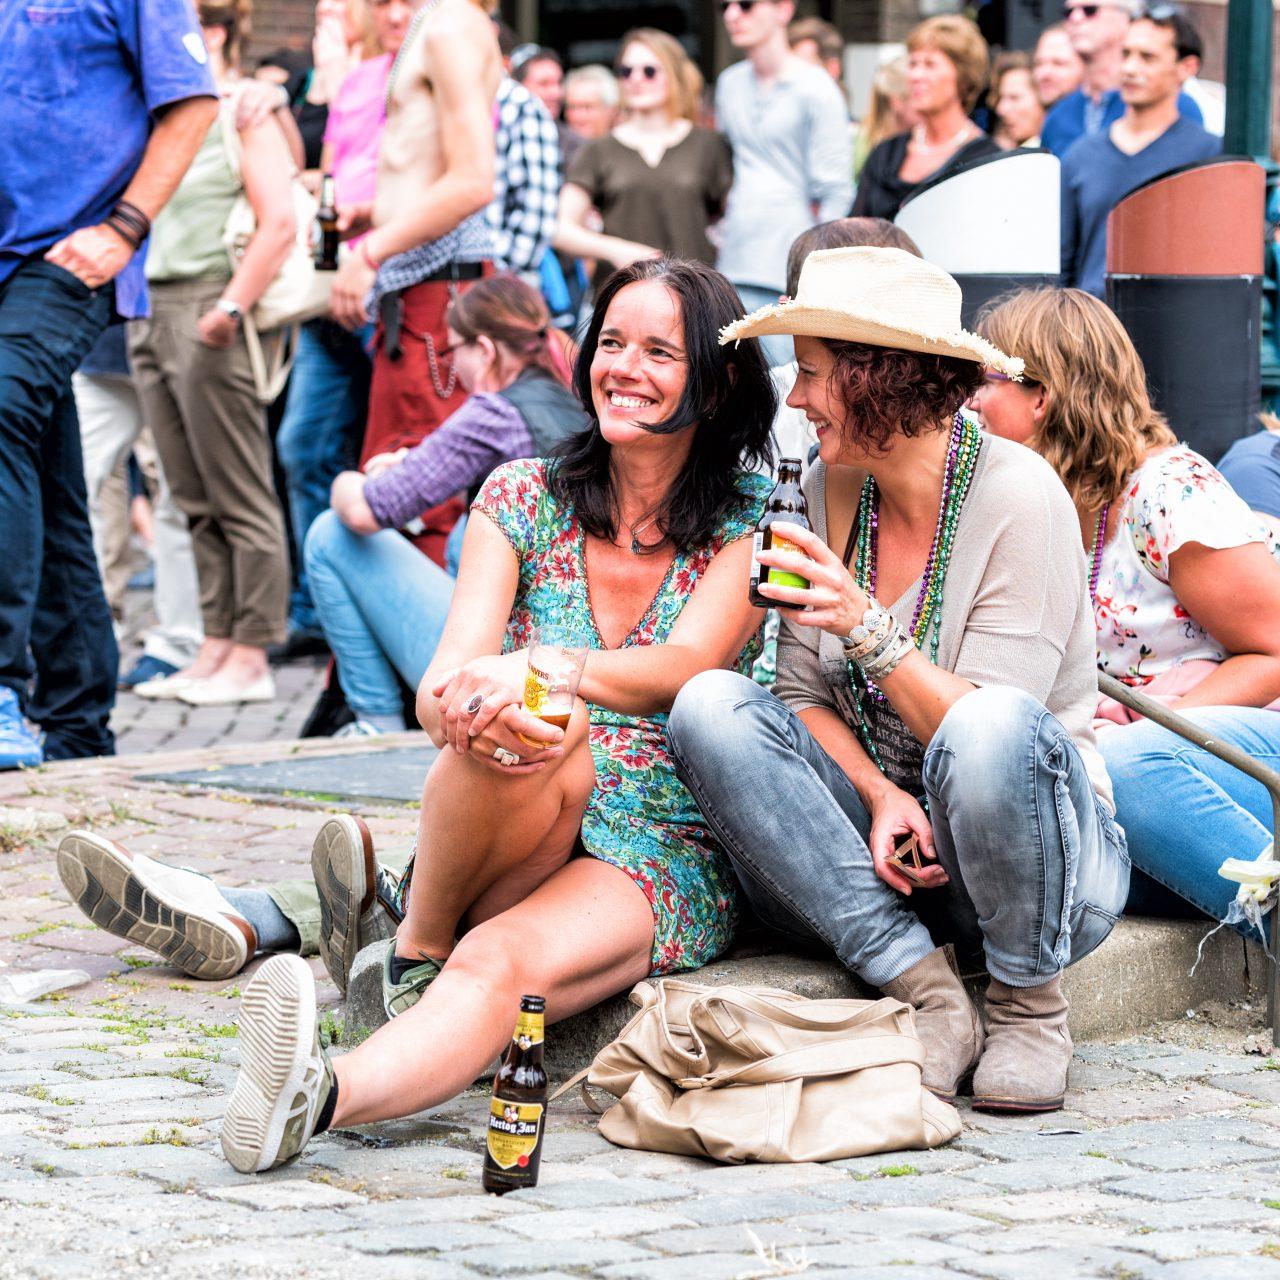 Big Rivers Festival - Dordrecht - evenementen - muziek - zomer